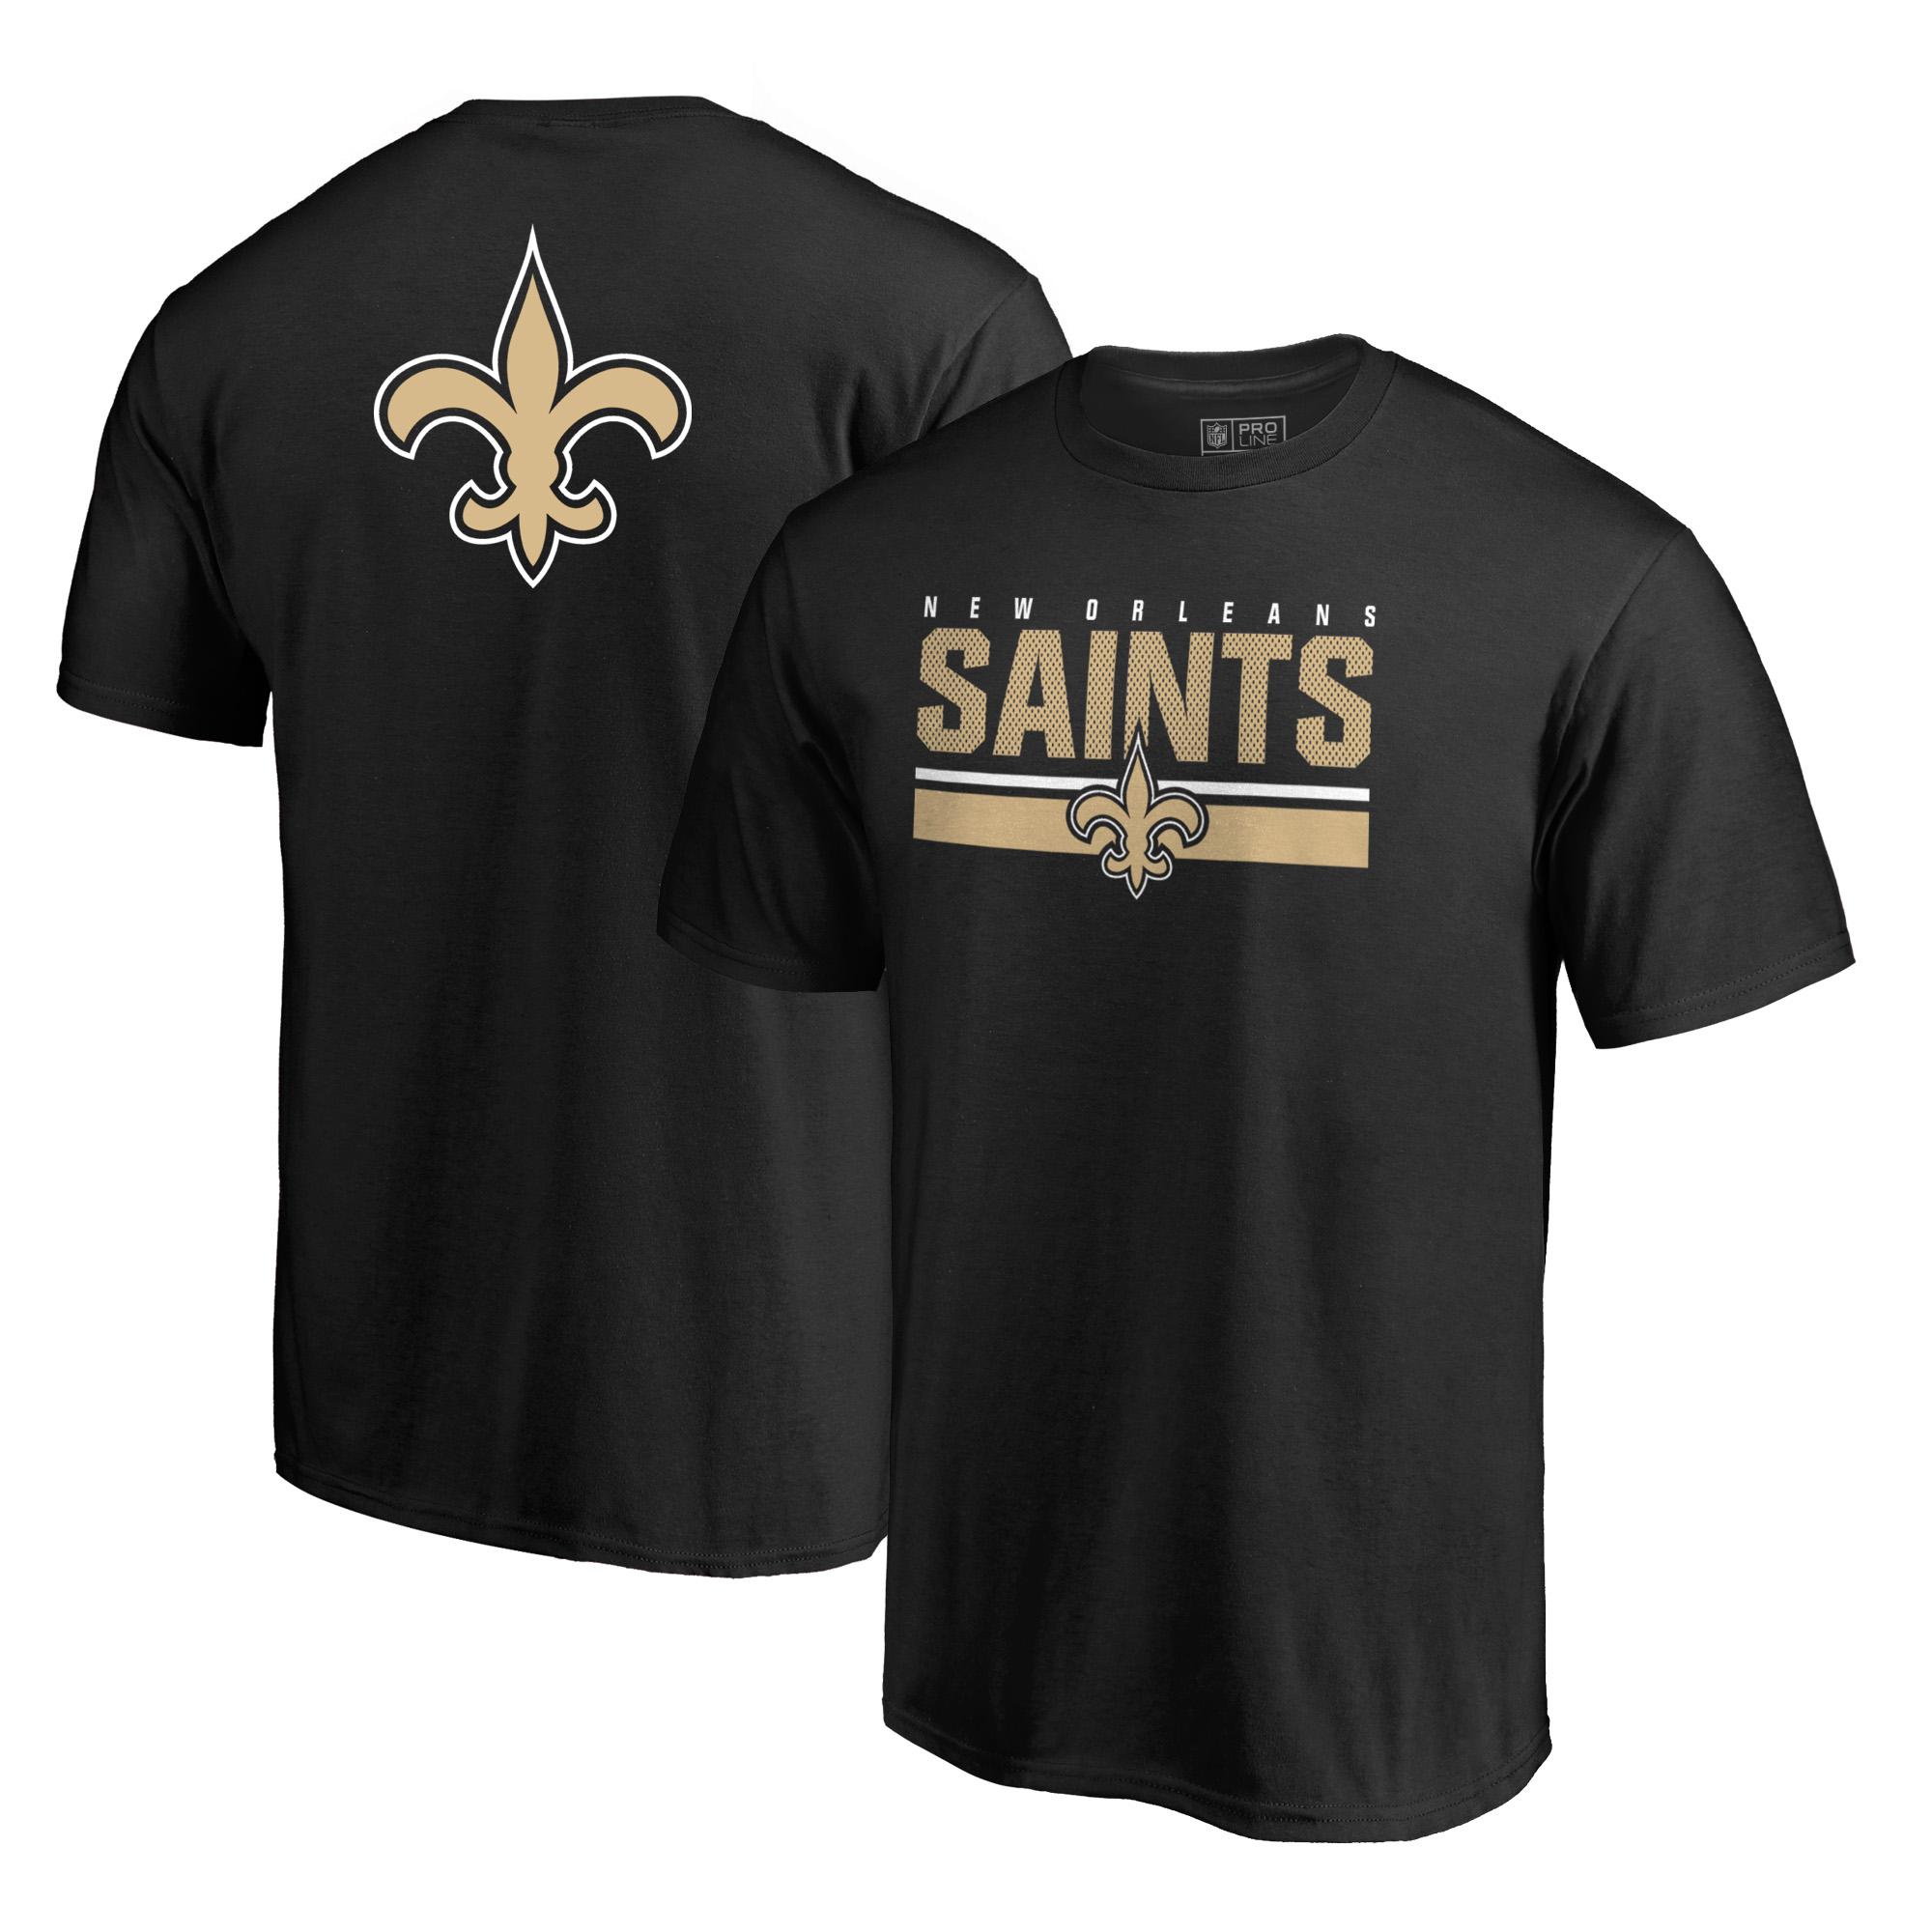 New Orleans Saints NFL Pro Line by Fanatics Branded End Game T-Shirt - Black